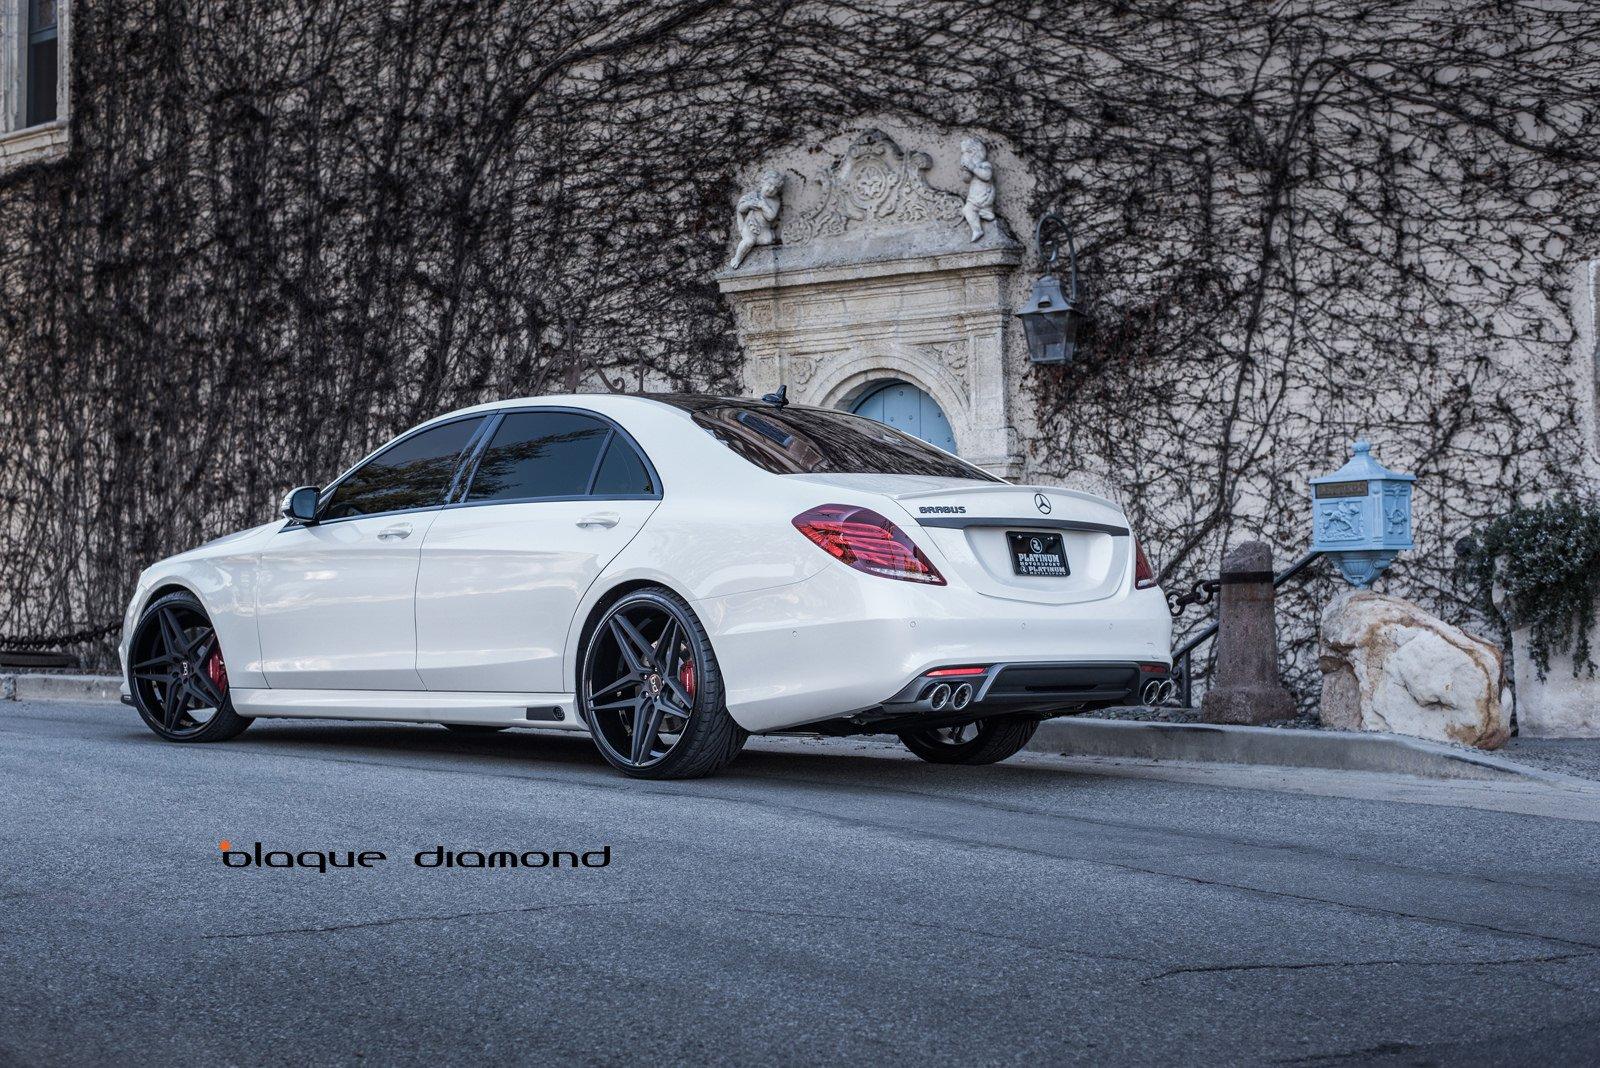 2014 mercedes benz s63 white sedan cars tuning wheels for White rims for mercedes benz